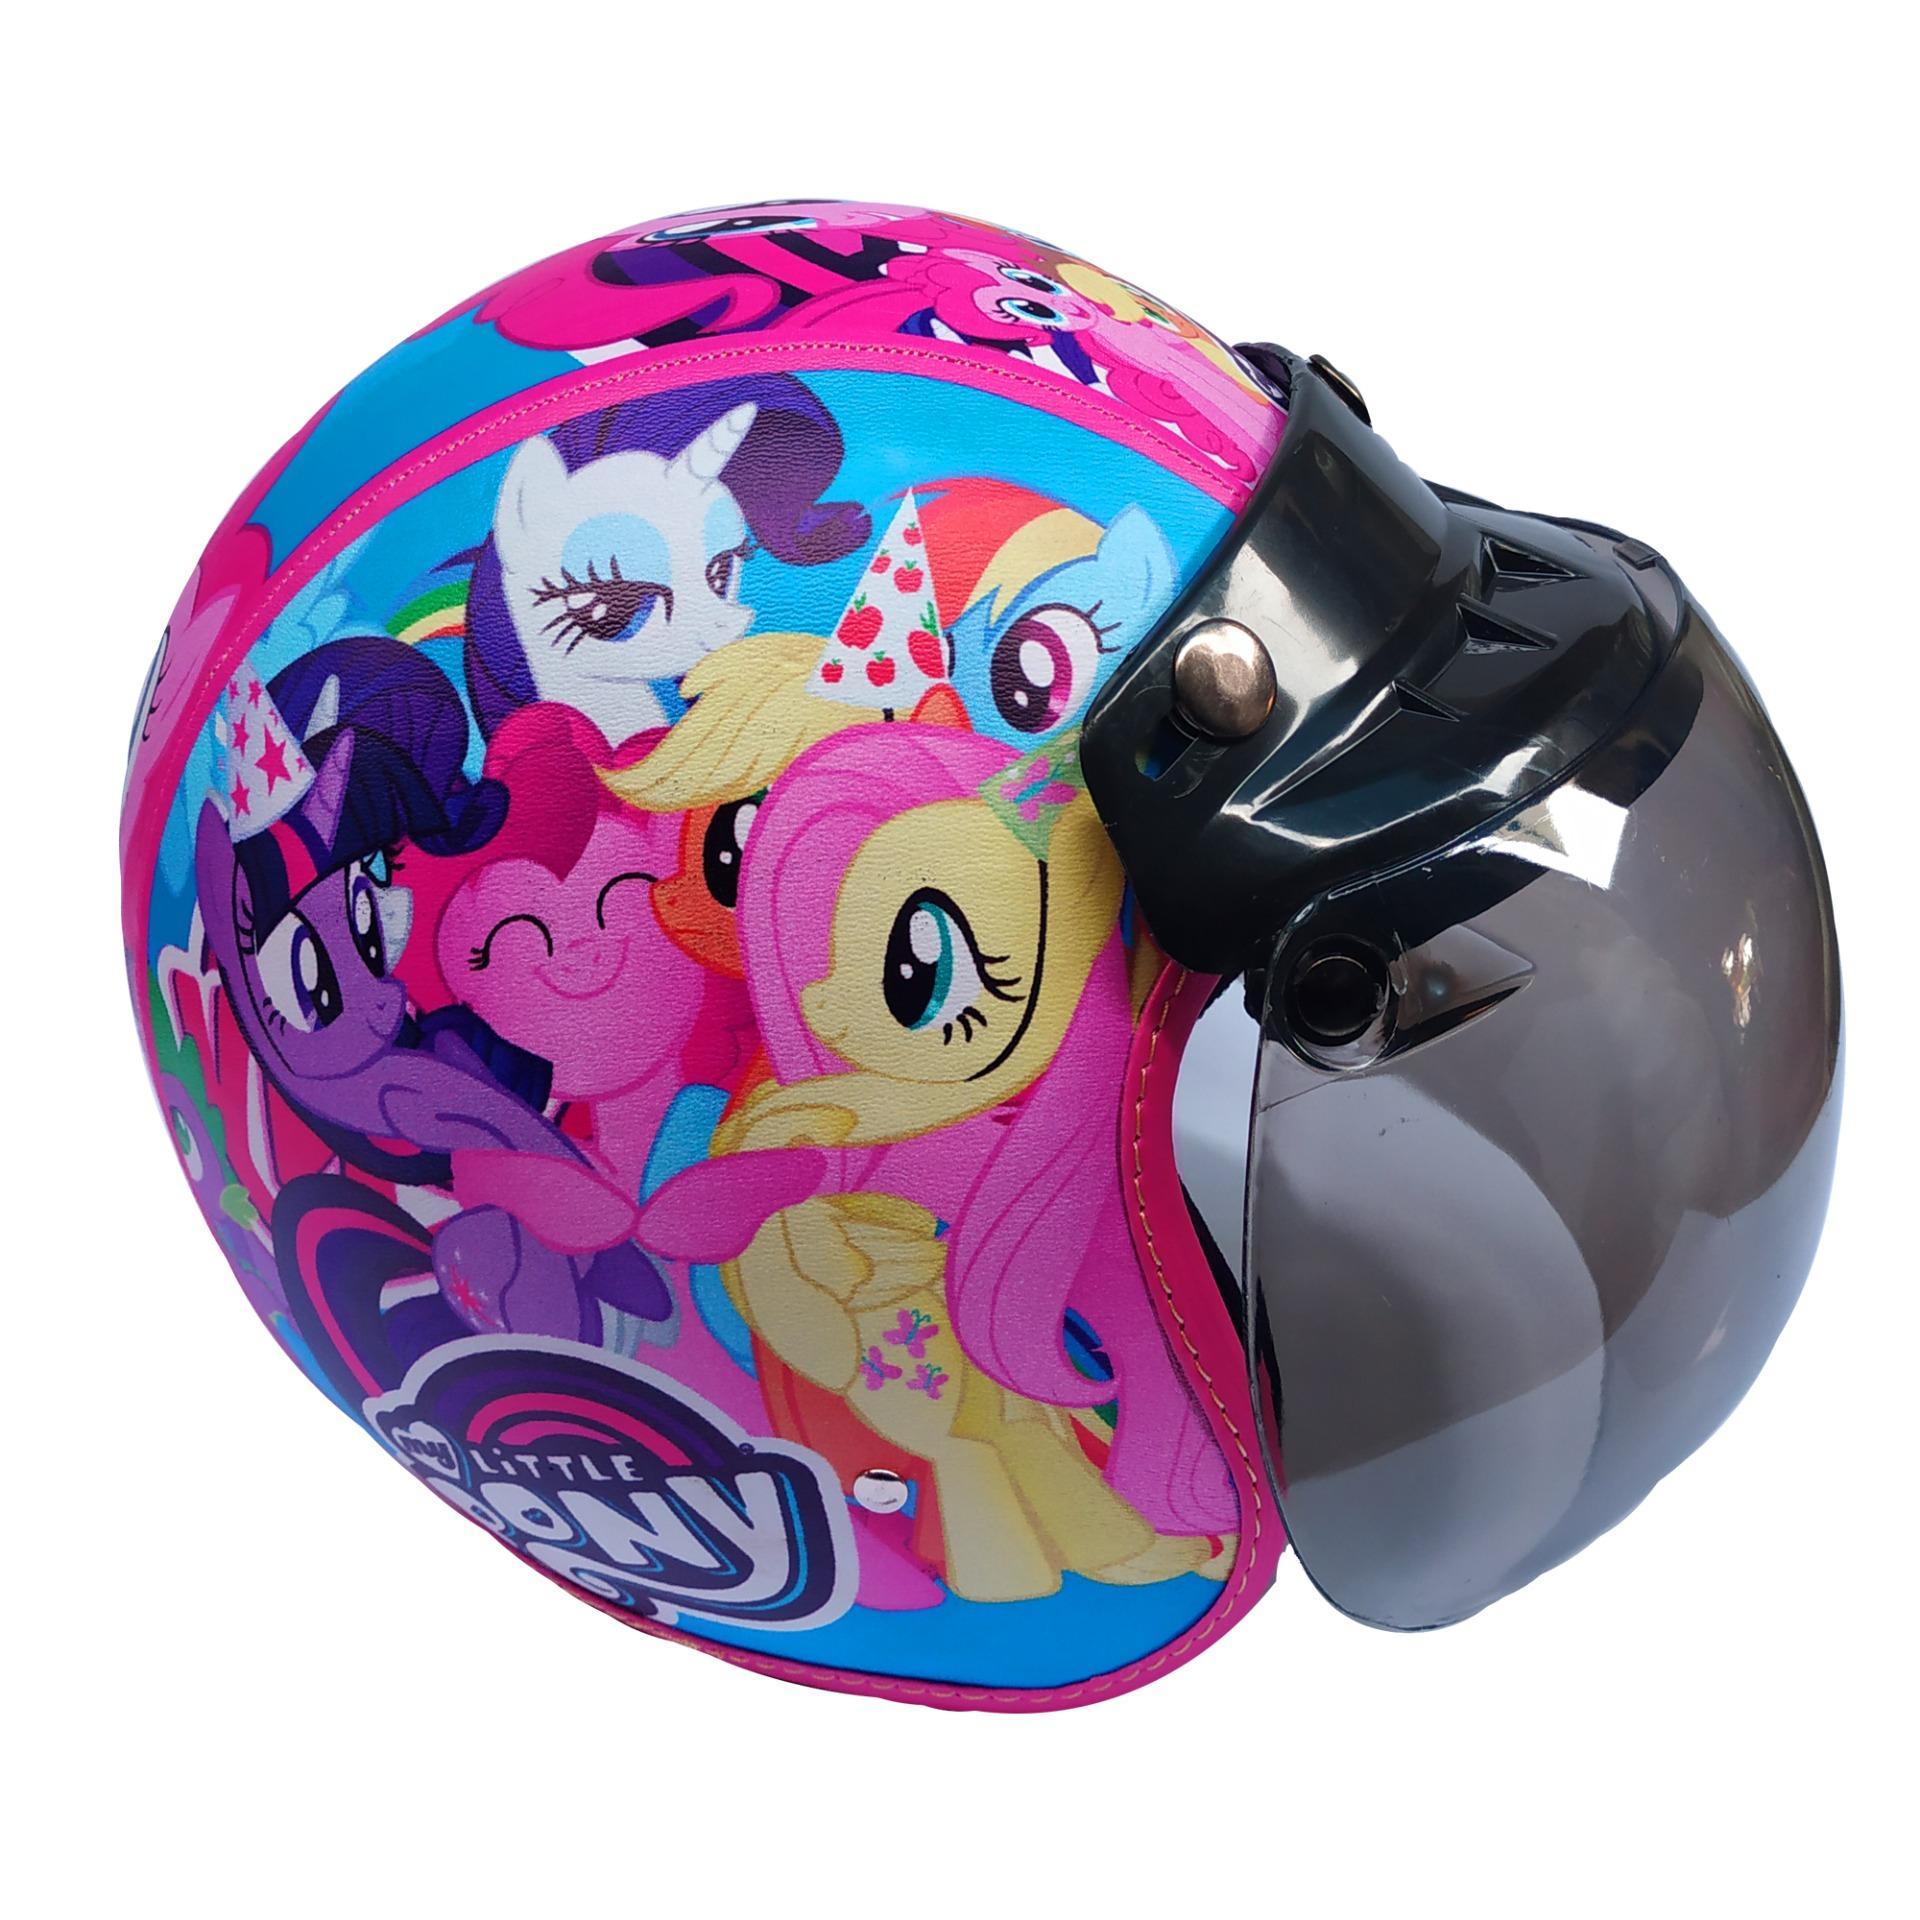 Helm Anak Bogo Motif Little Pony Pink Usia 2-7 Tahun Lapis Kulit Sintesis